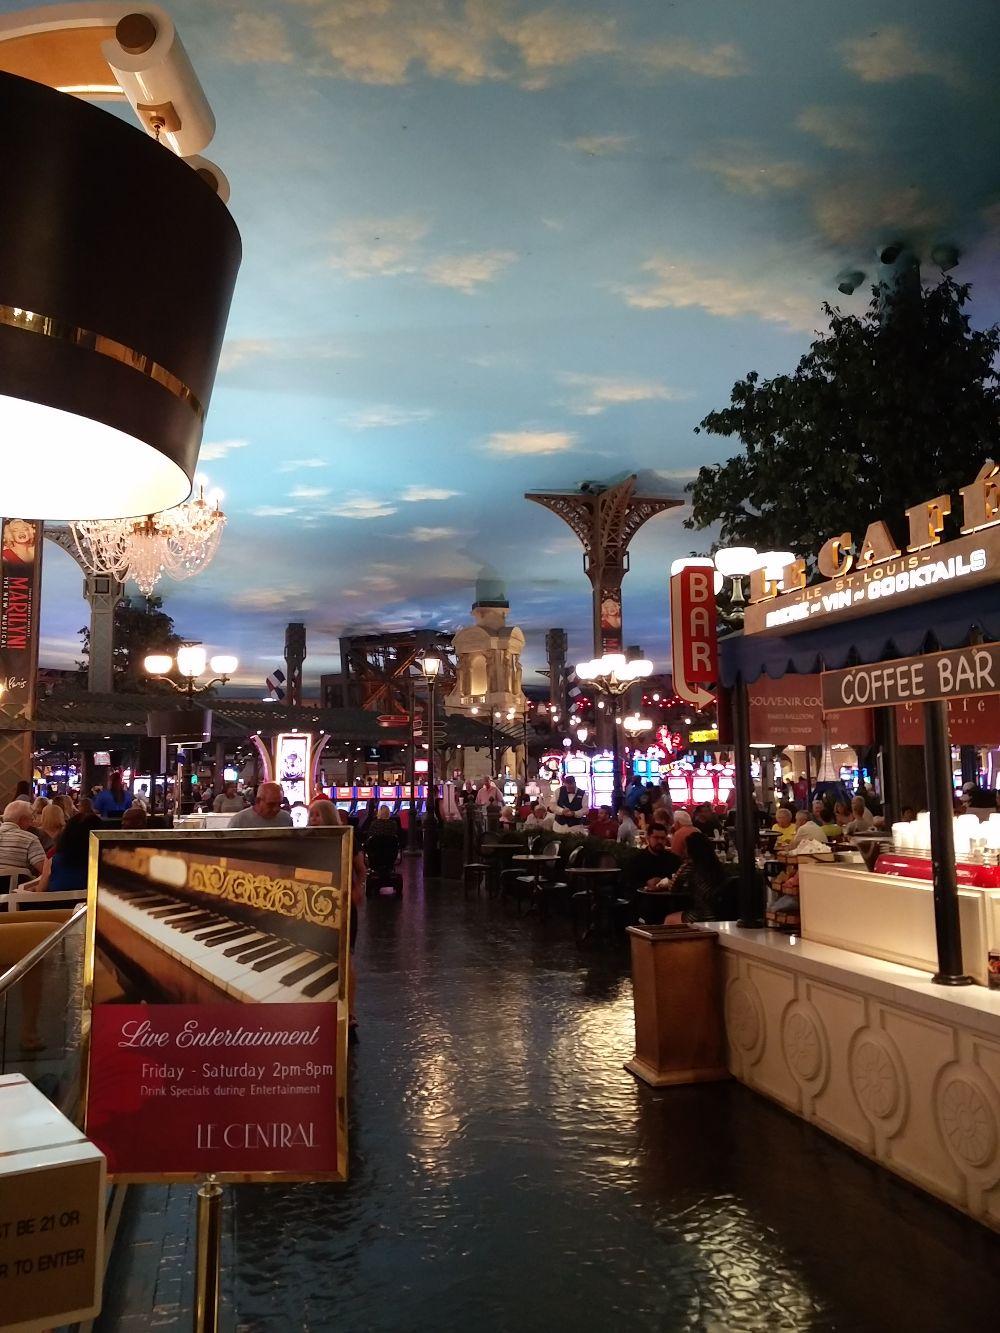 Himmel des Kasinos Paris in Las Vegas